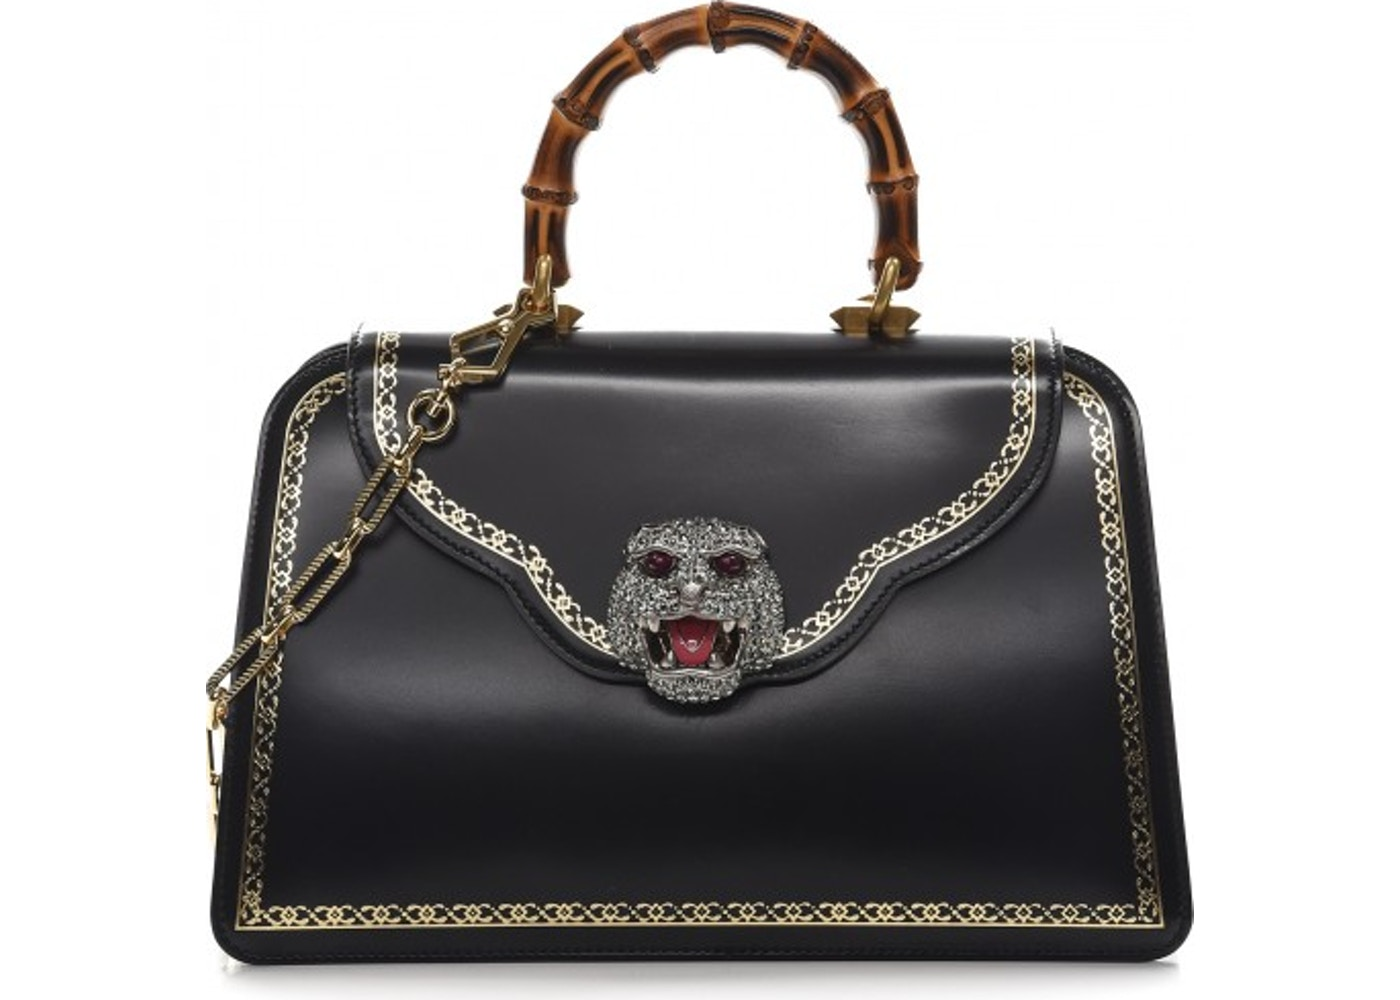 25e71fce4 Buy & Sell Gucci Other Handbags - Average Sale Price